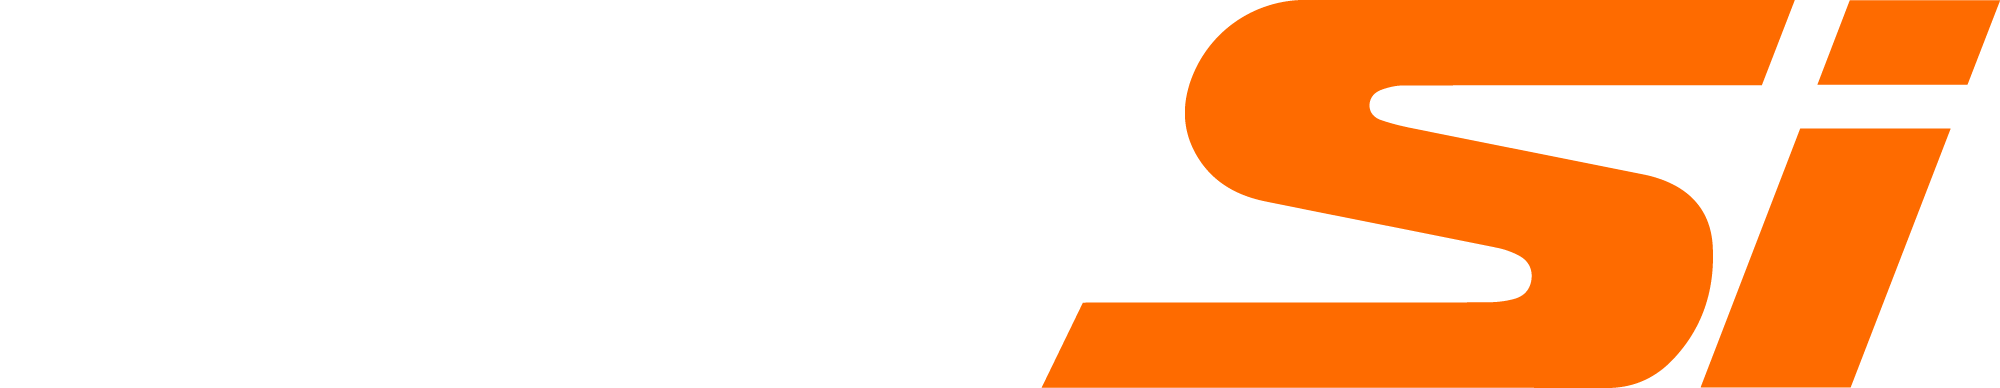 Civic SI Logo.png